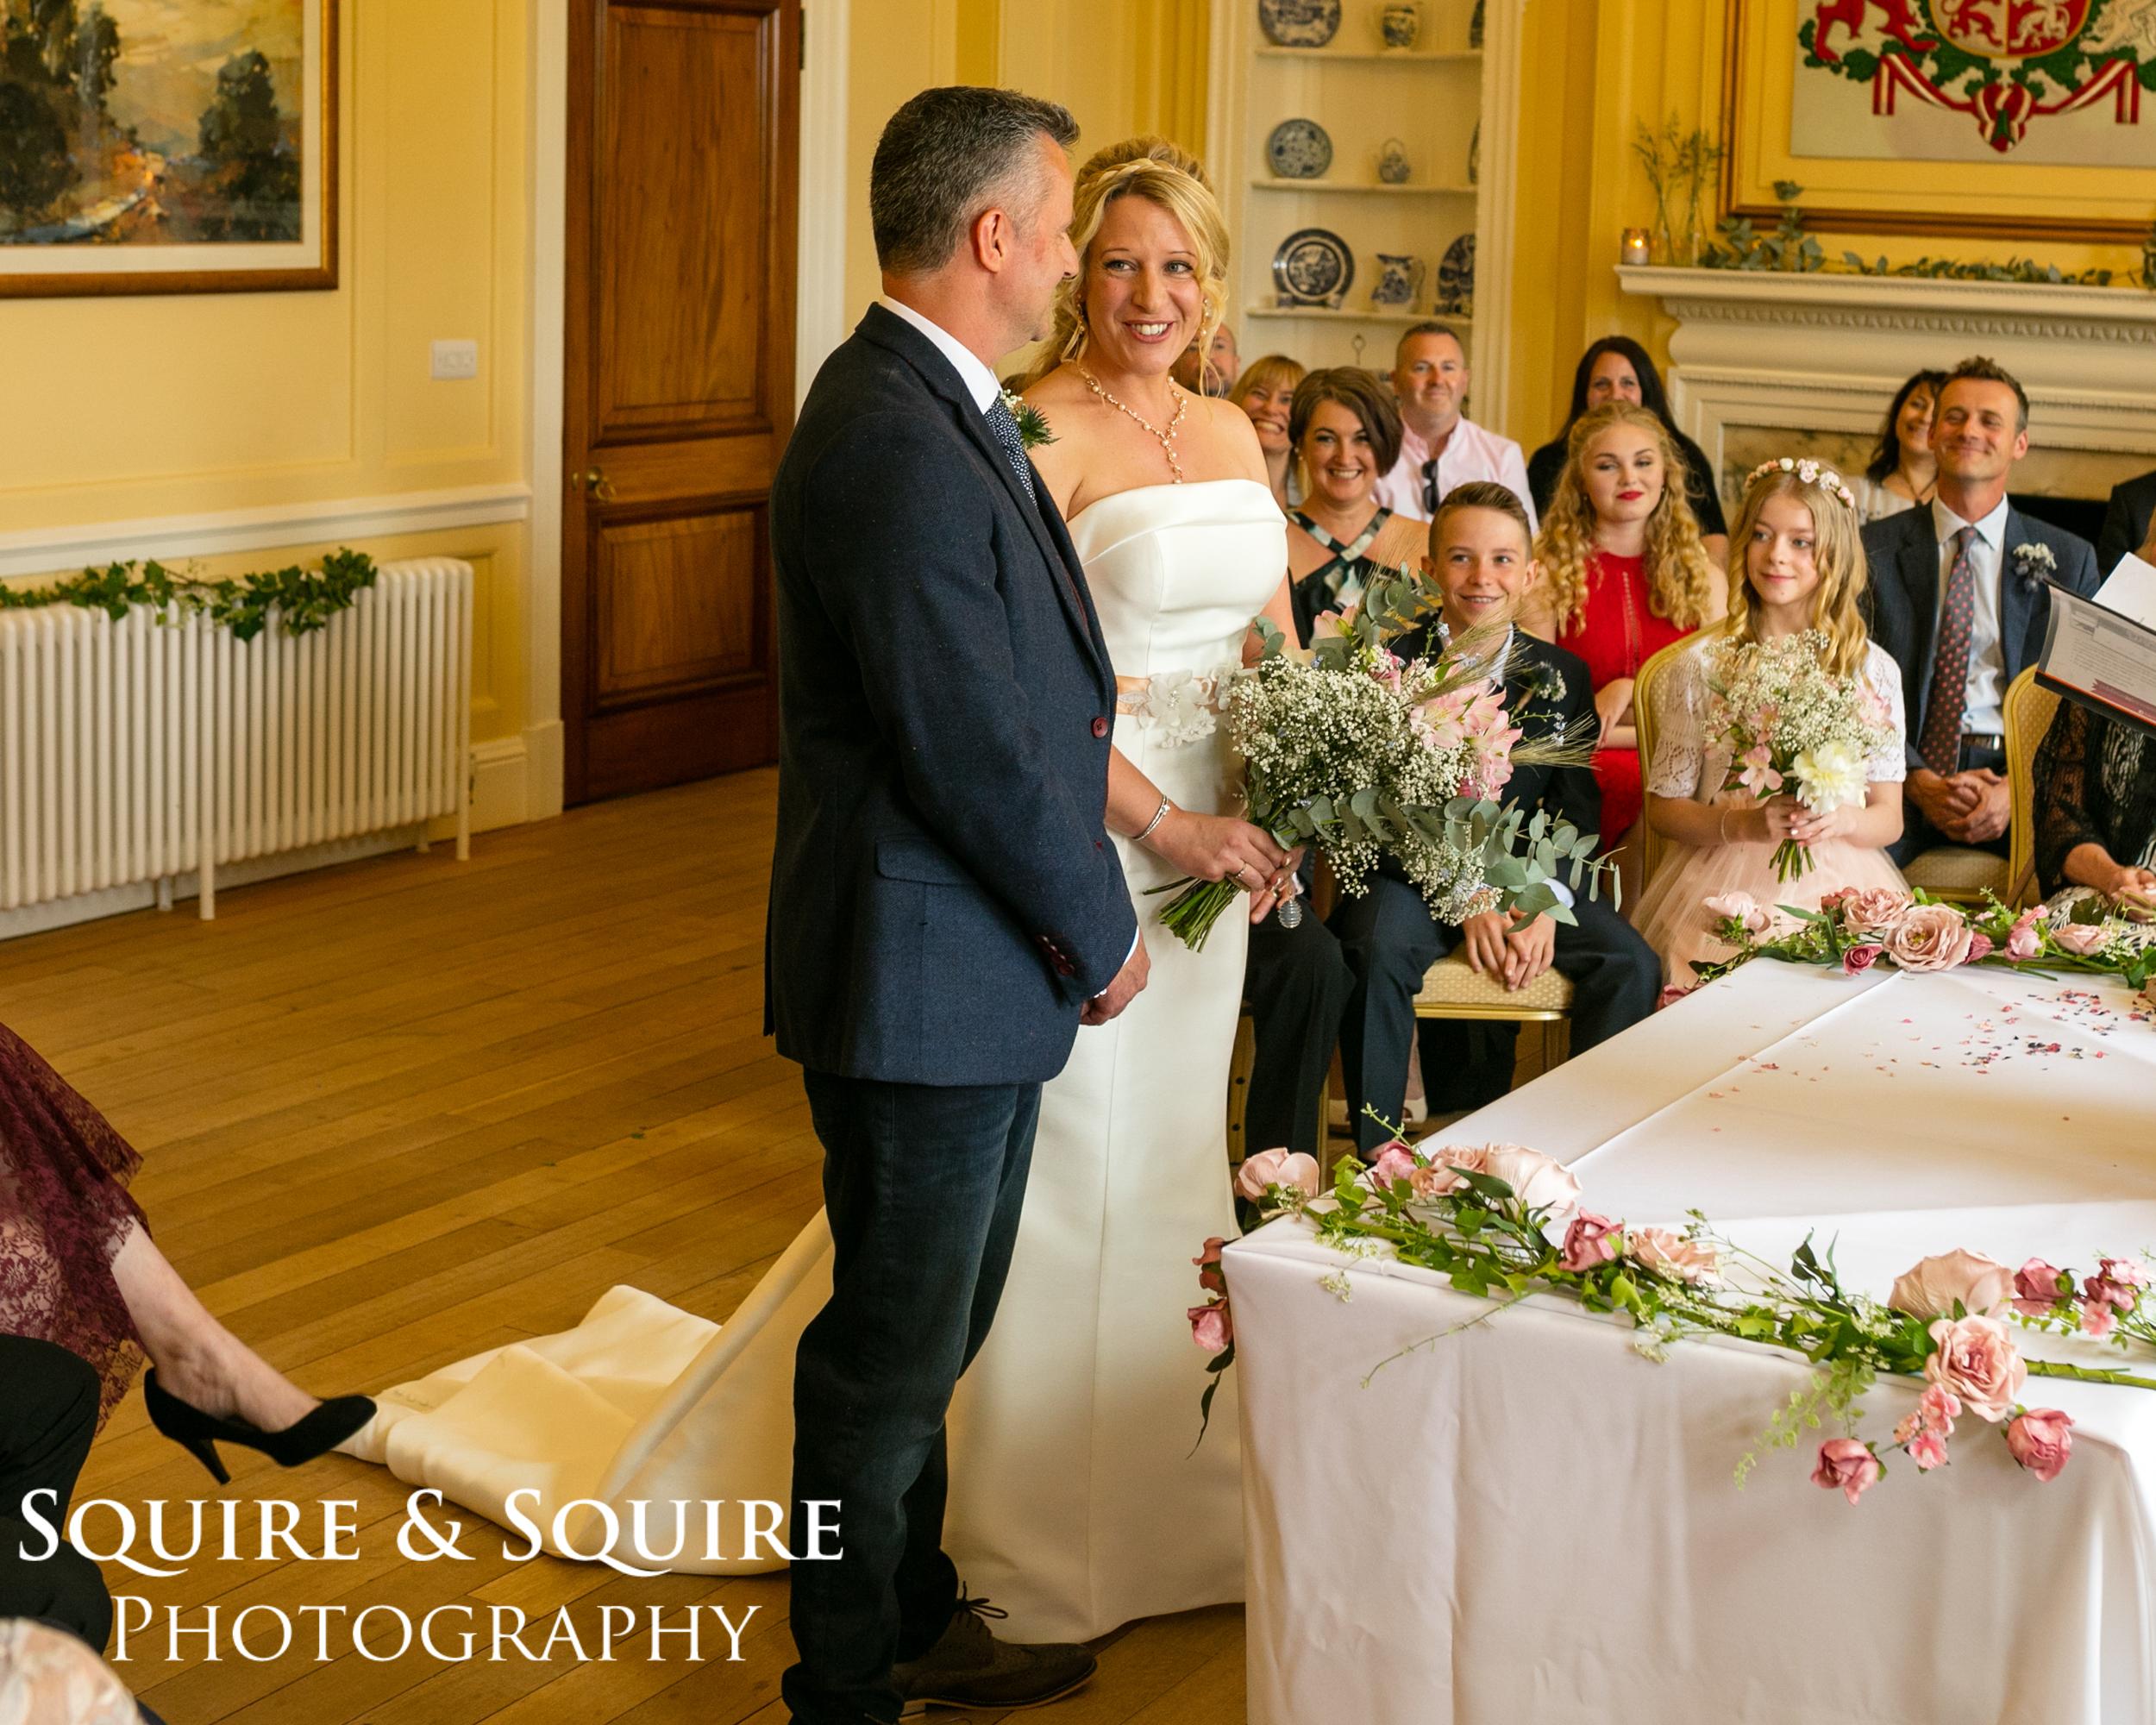 wedding_photography_catthorpe Manor (29 of 66).jpg